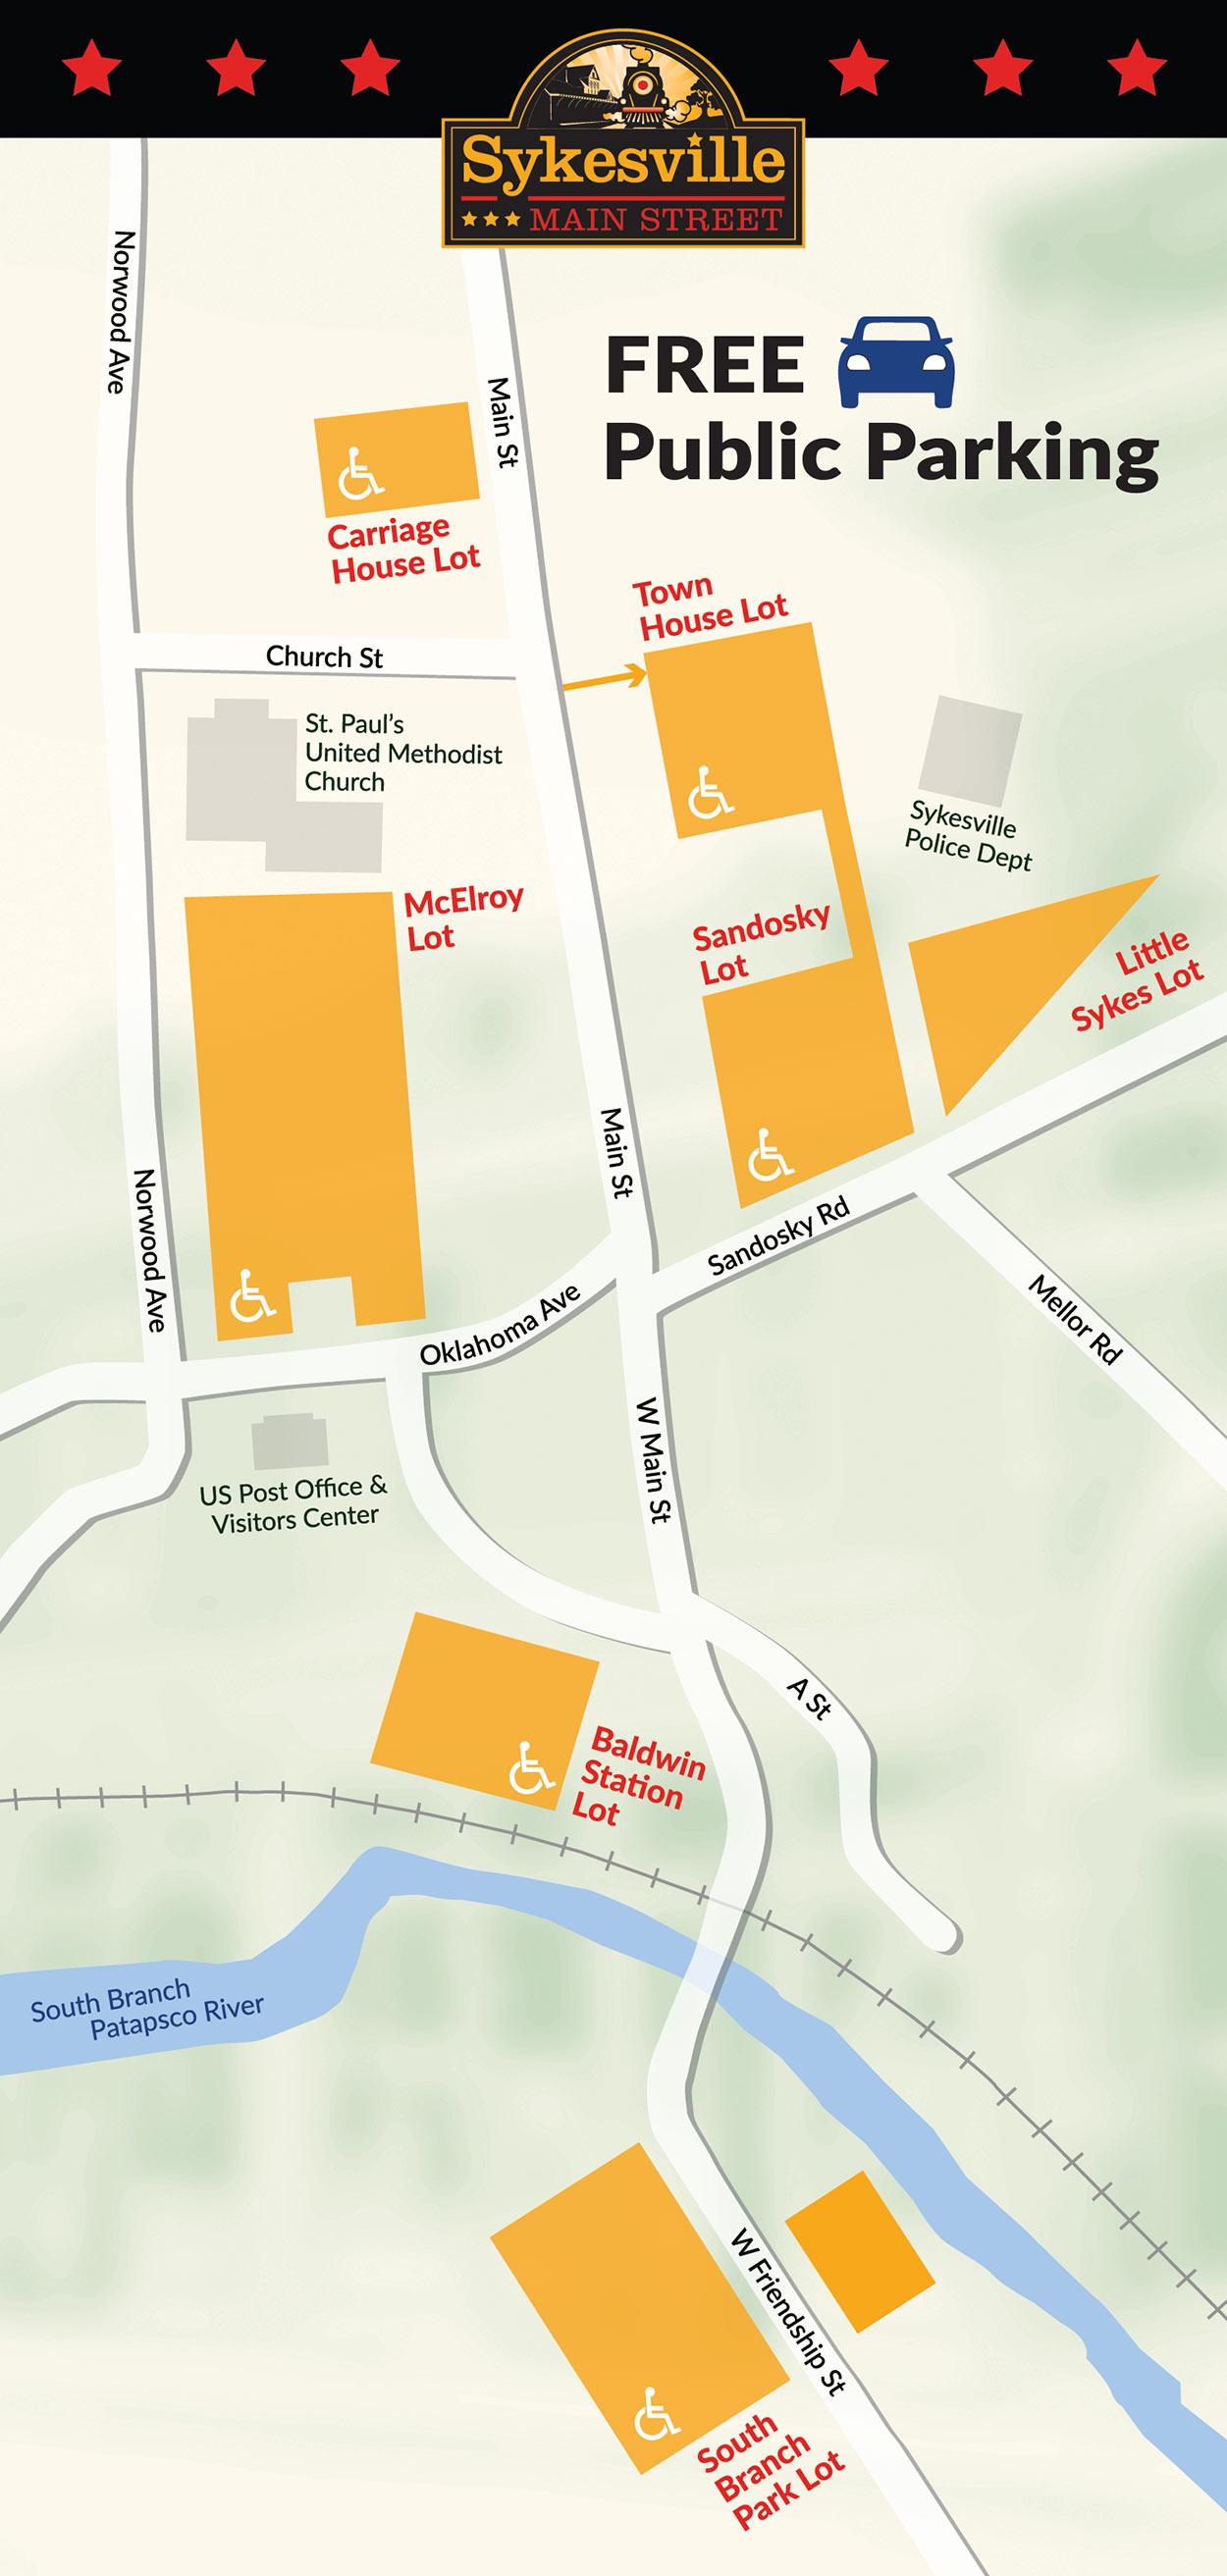 FREE Public Parking Map